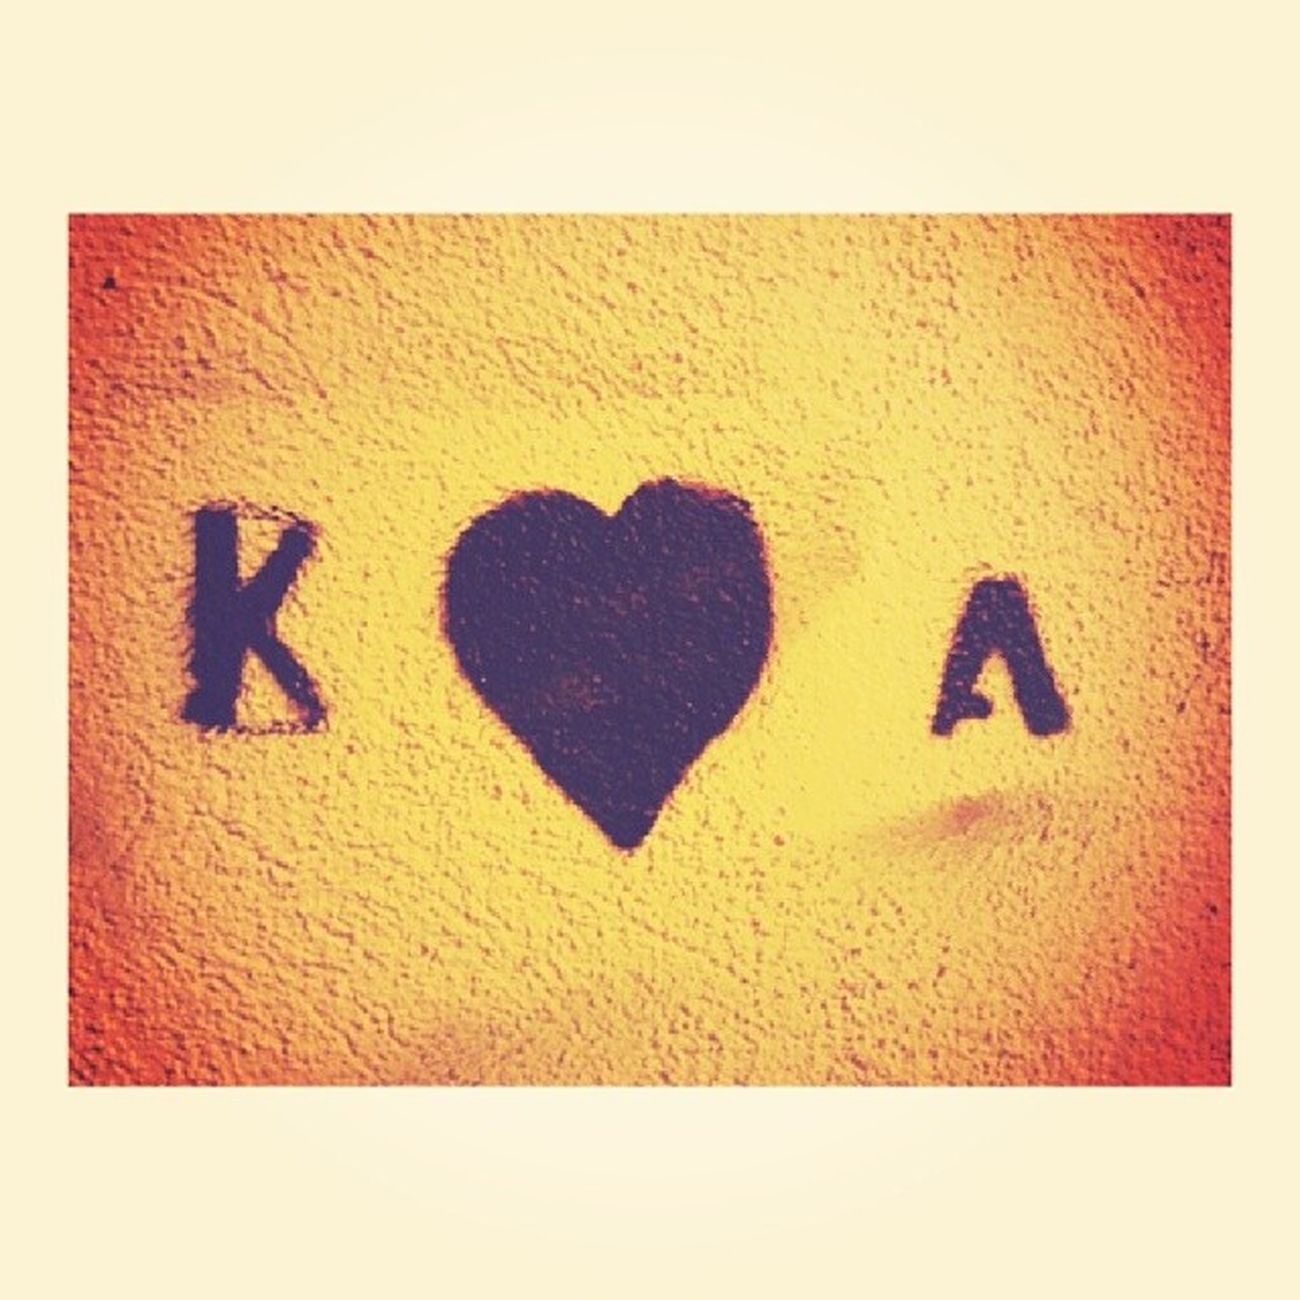 K?A Amordehermana Tequiero Yocreo Aixala sister stupída love